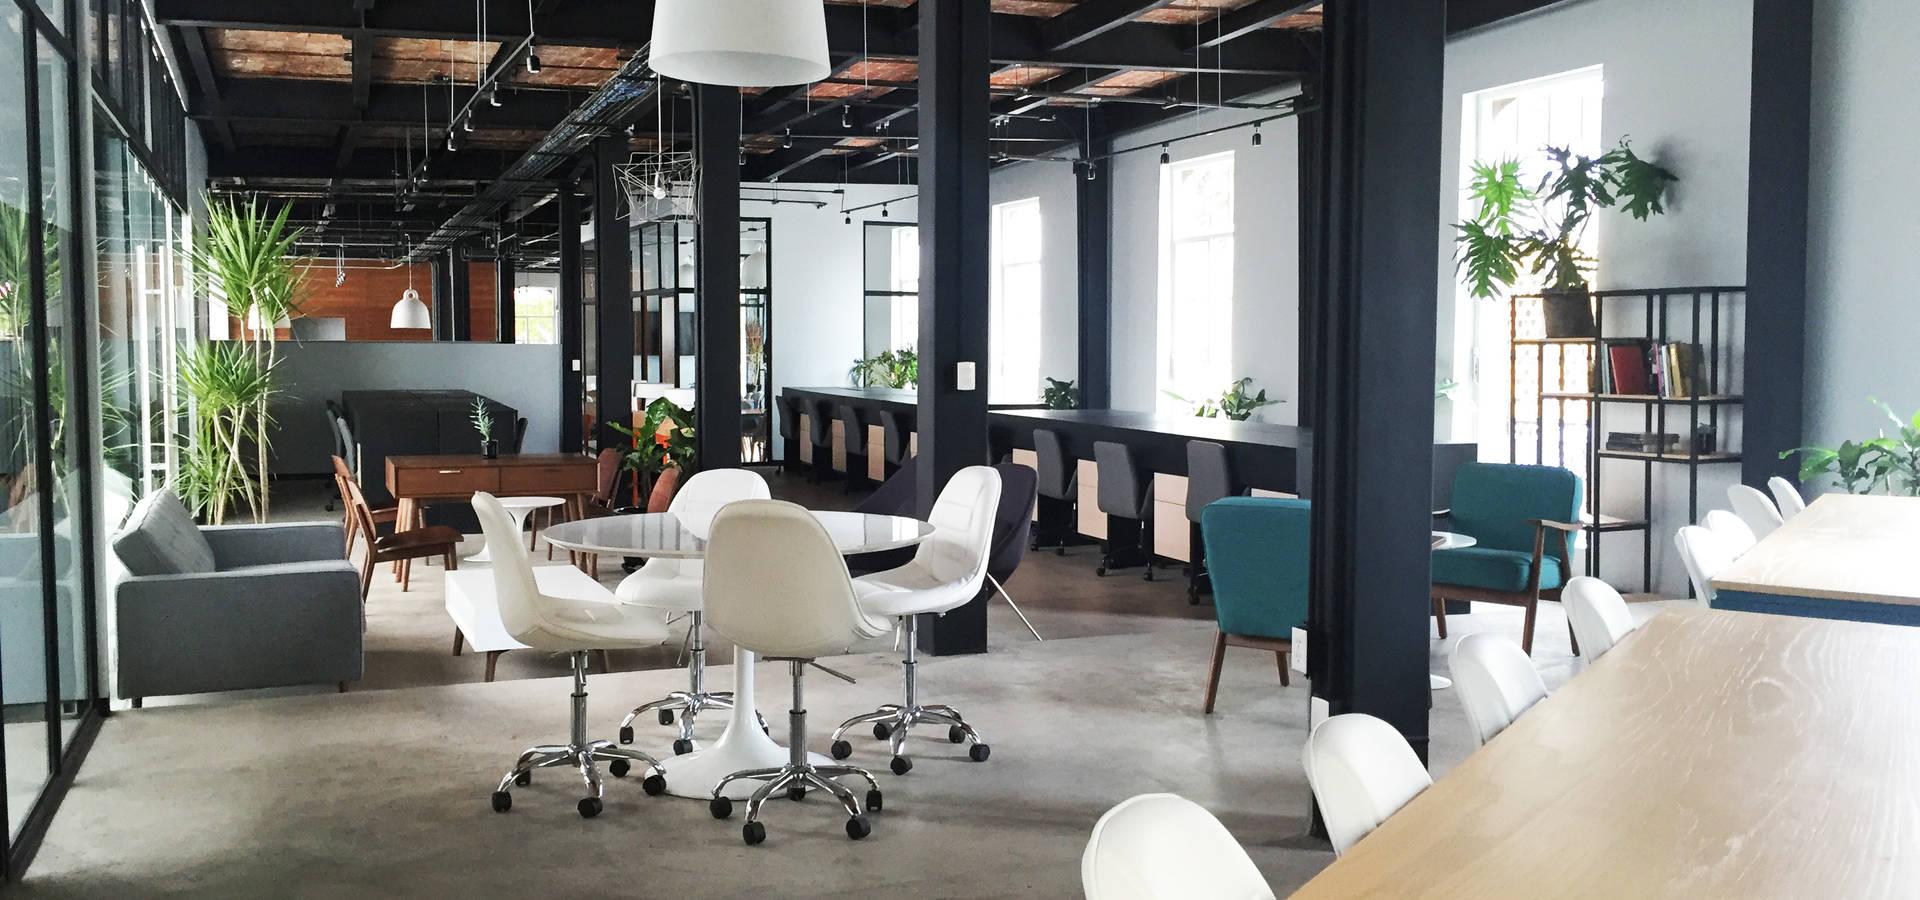 Oficinas en Av. Insurgentes Sur von Alinka Interiorismo | homify